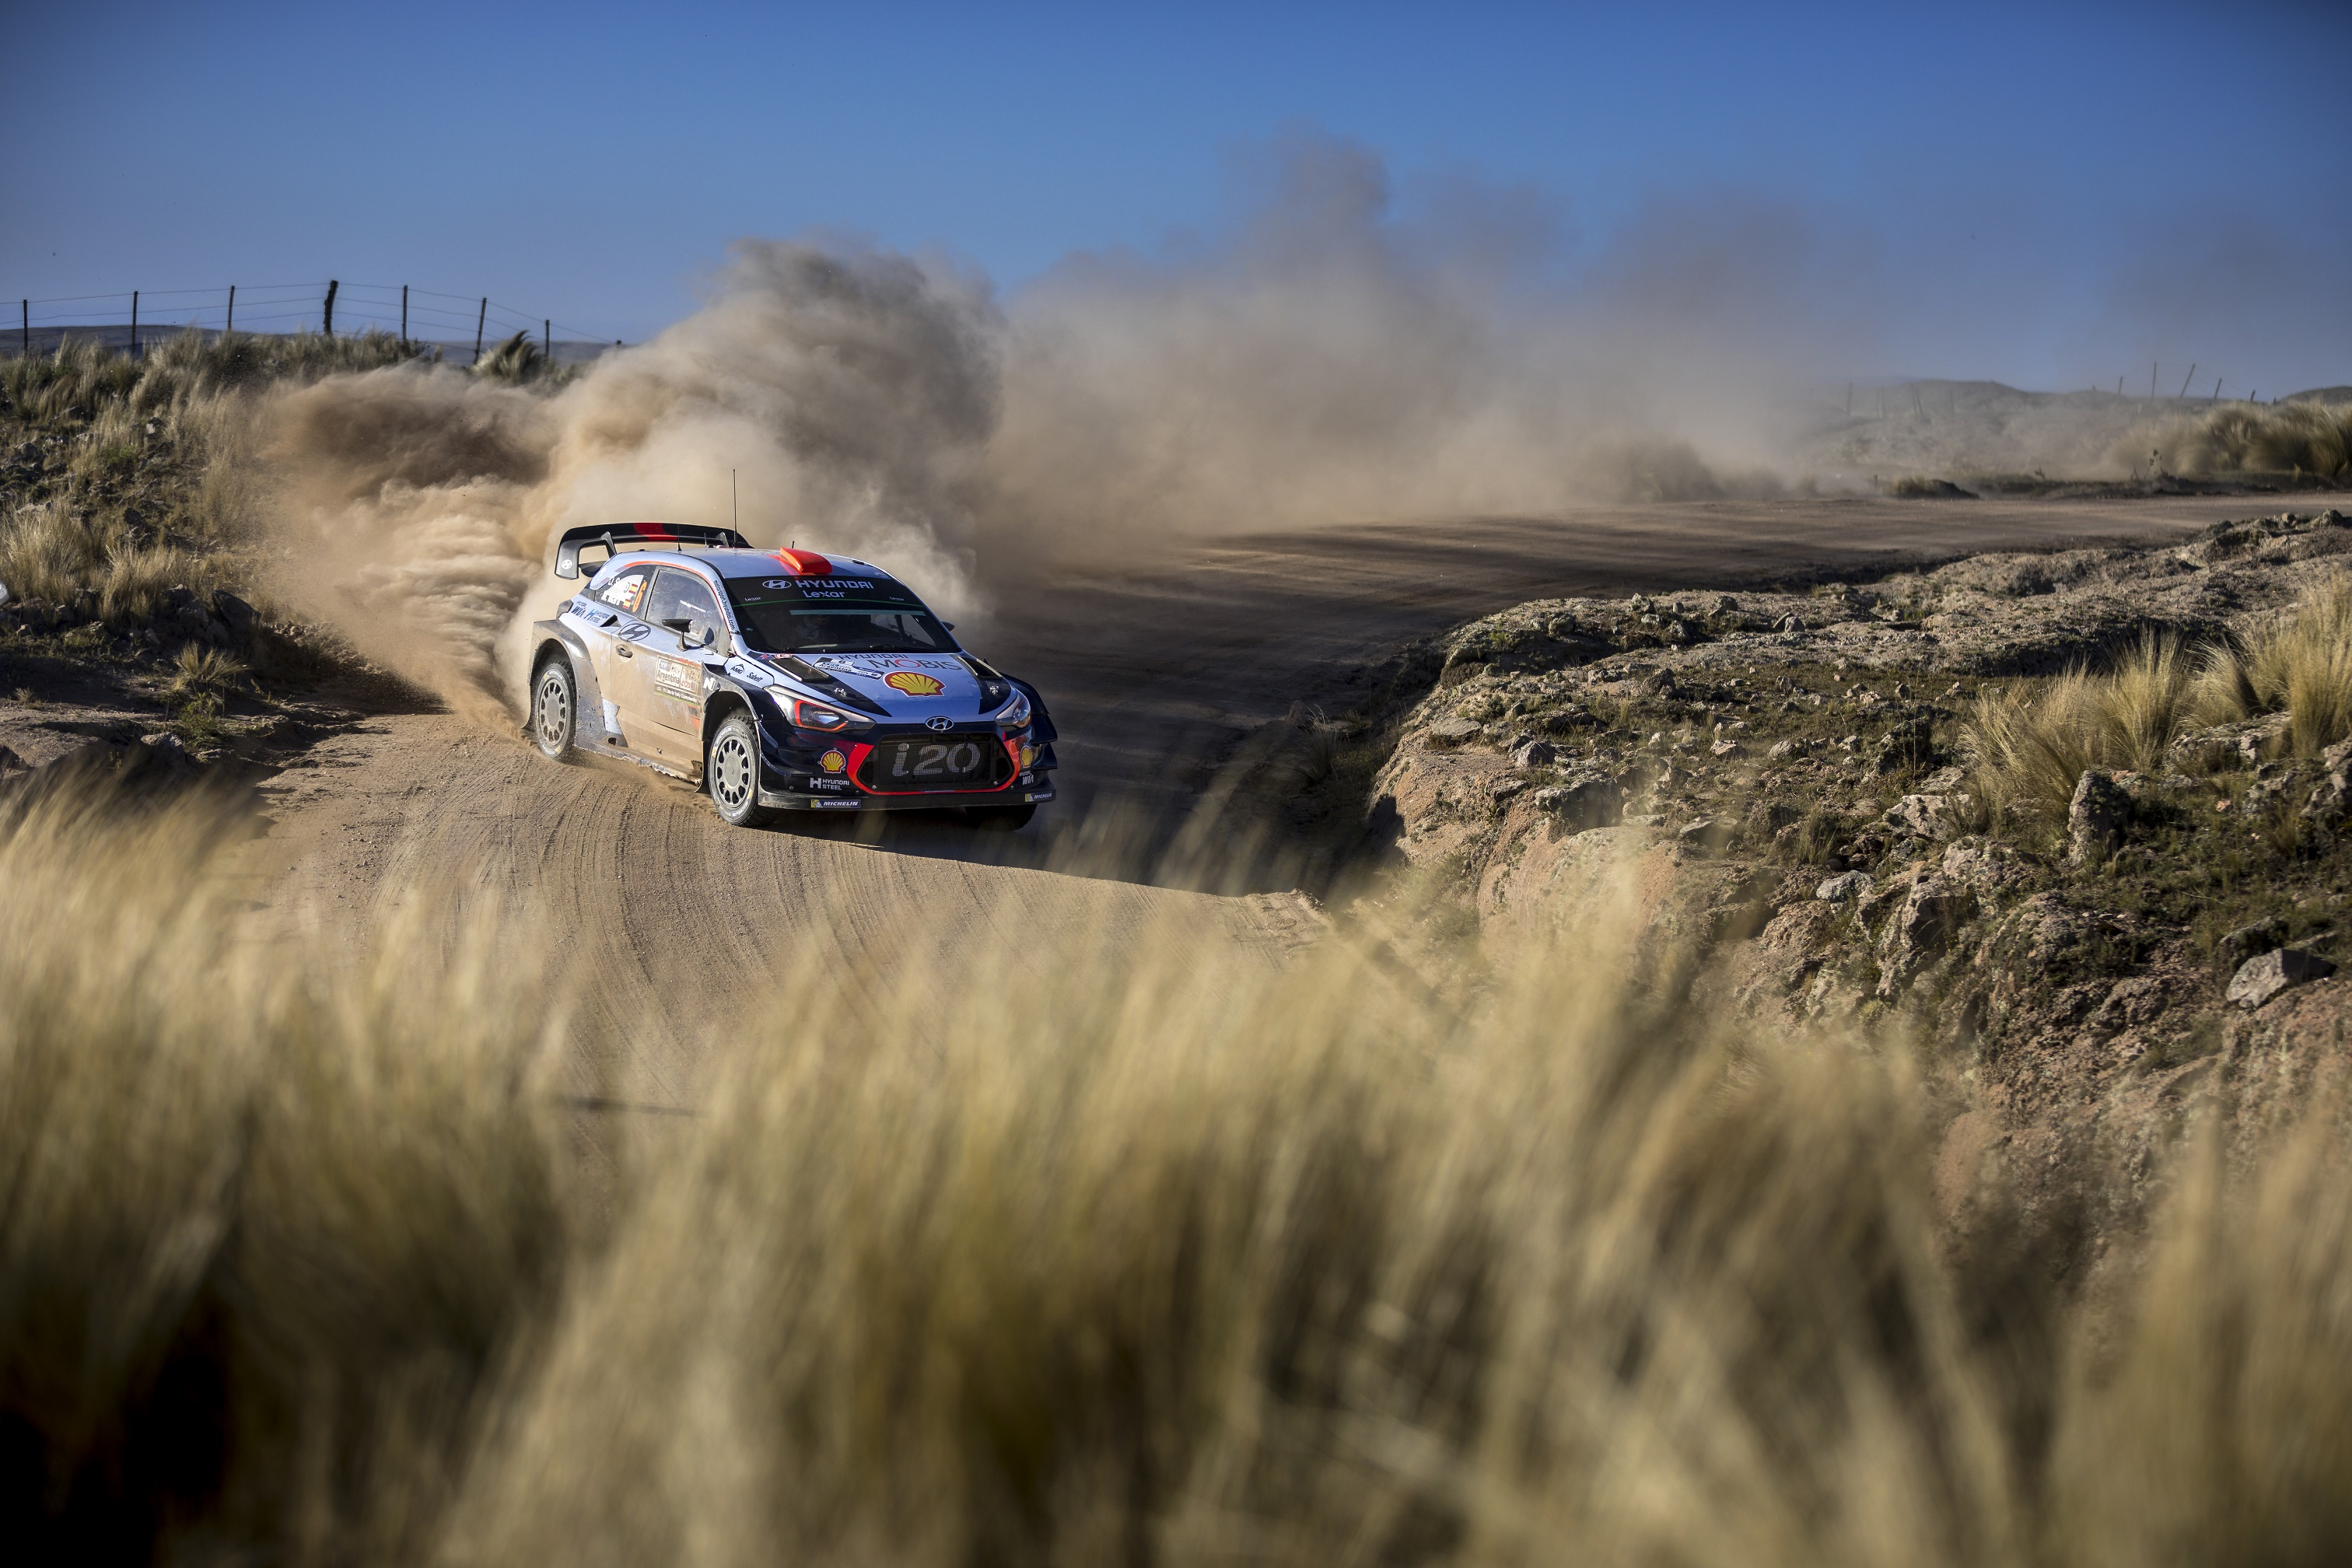 https://www.promotionmagazine.it/wp/wp-content/uploads/2017/05/Hyundai-WRC-1.jpg